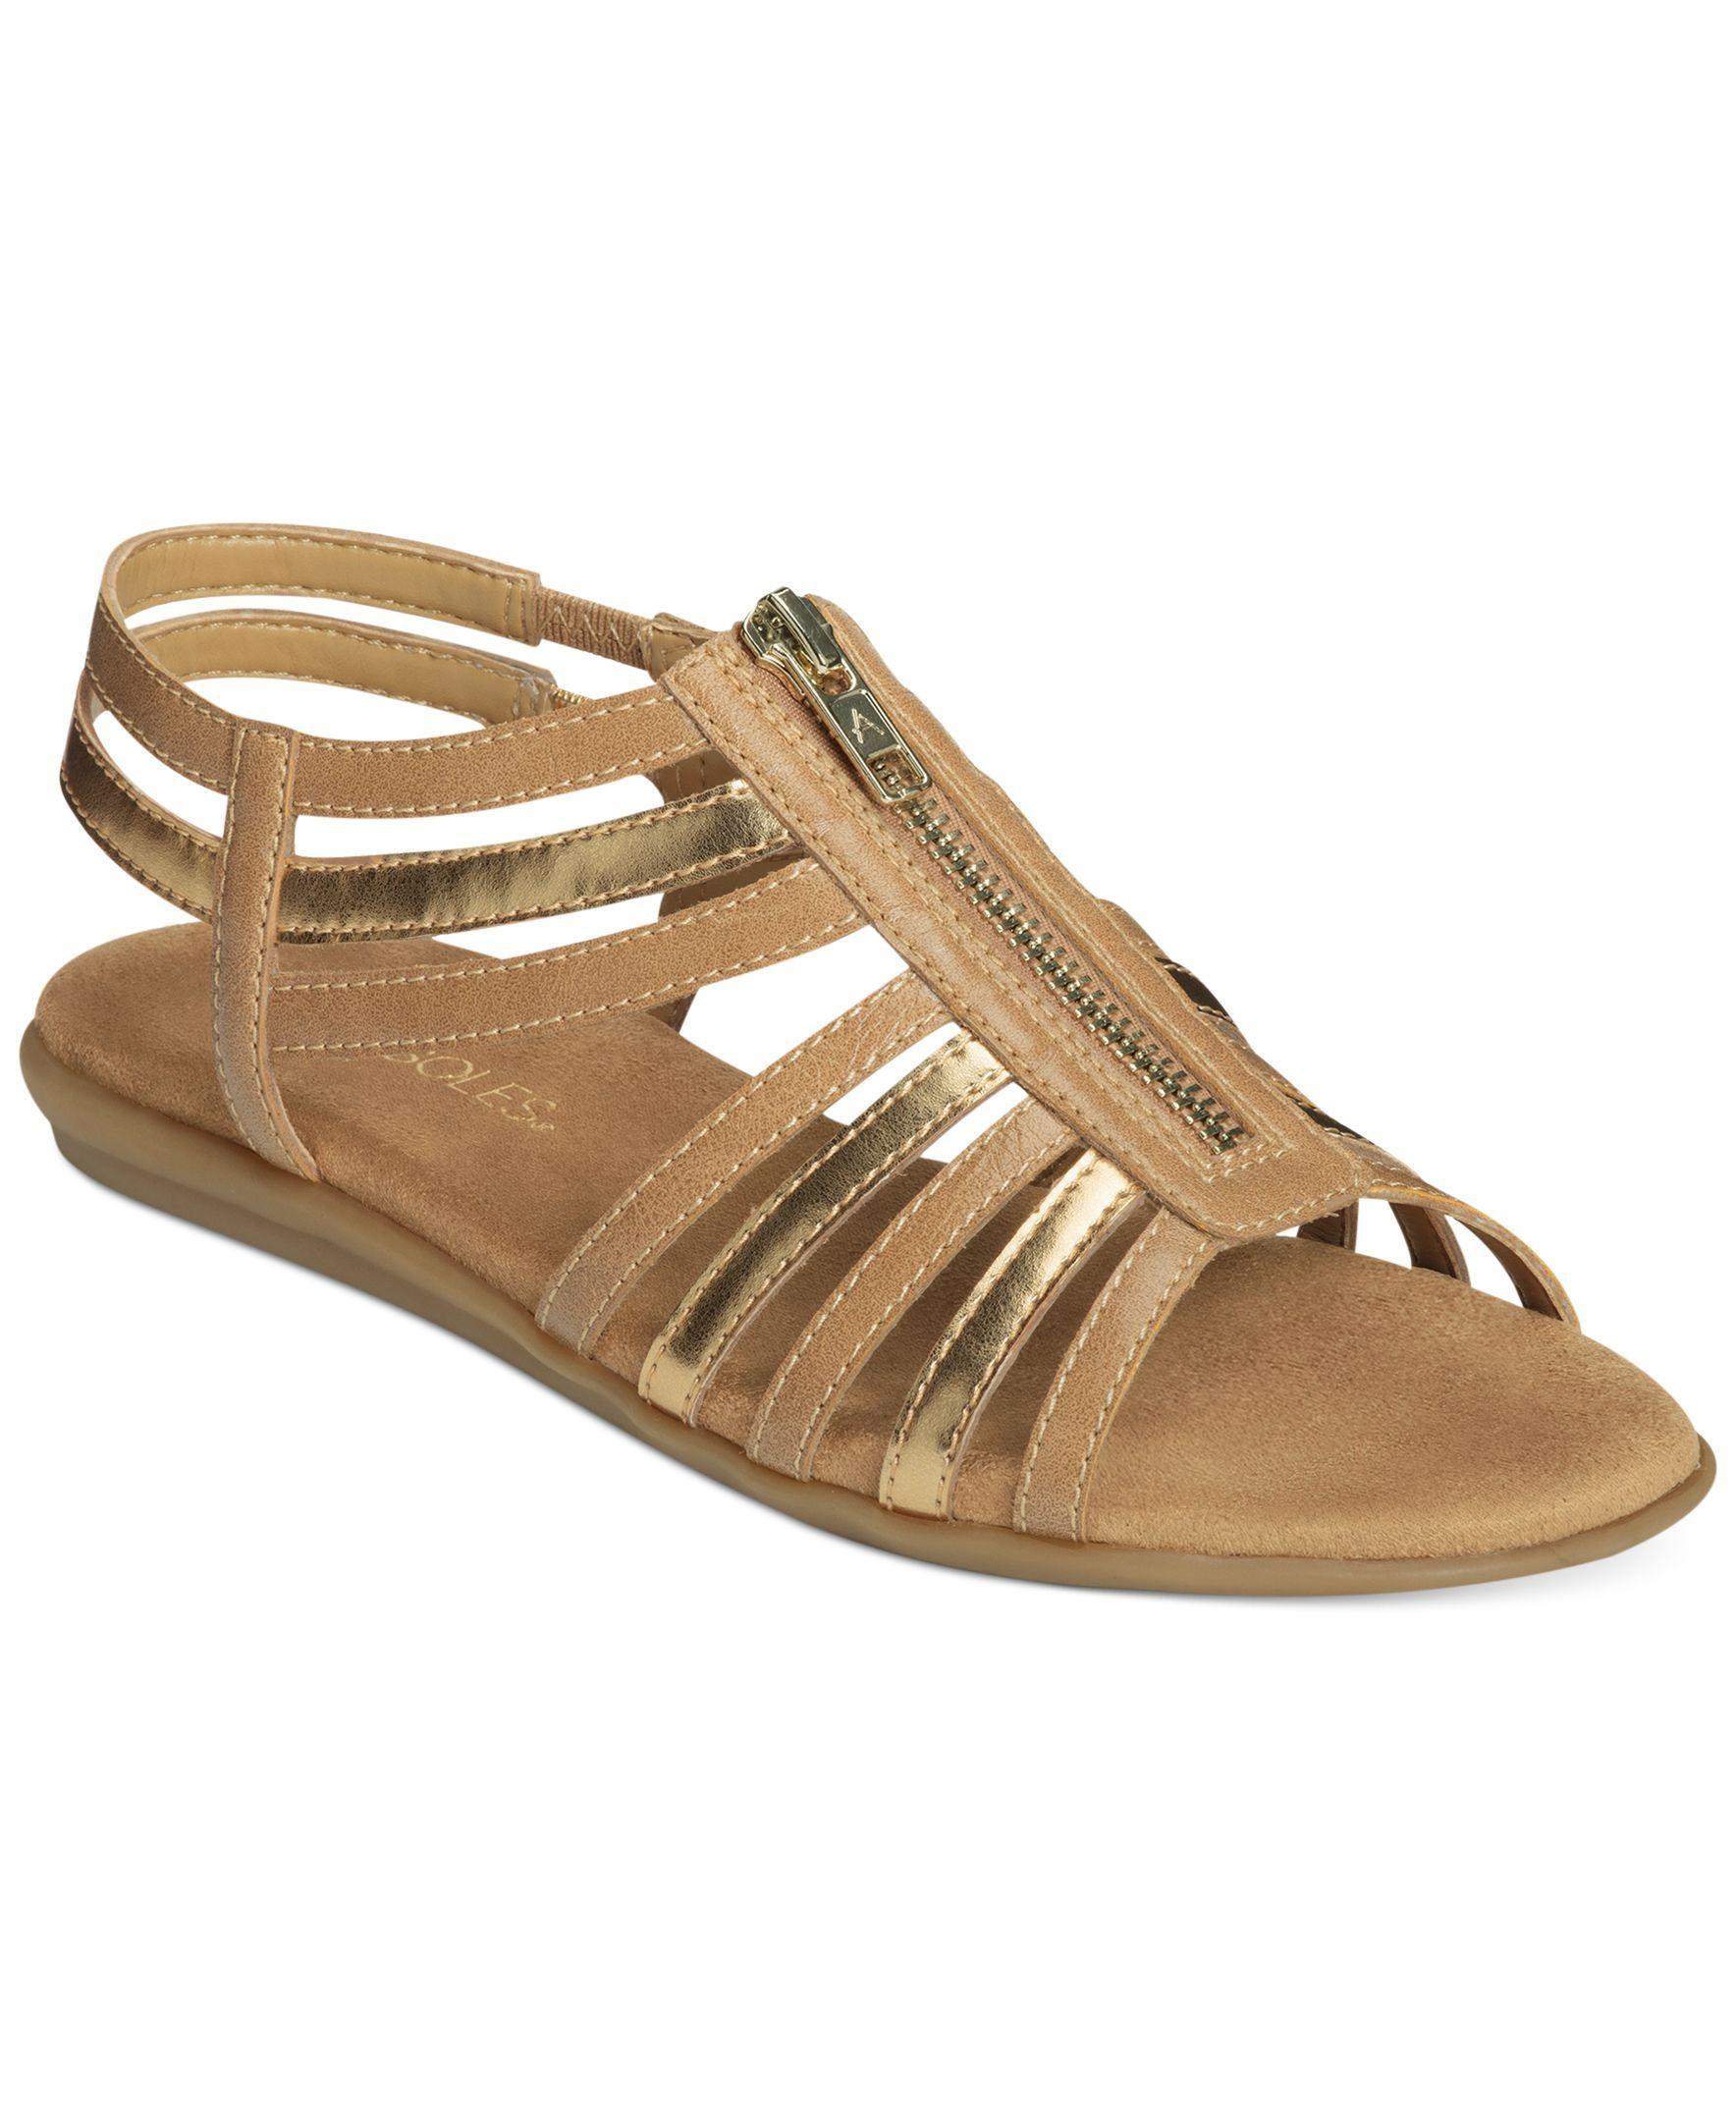 Aerosoles Chlothesline Flat Sandals